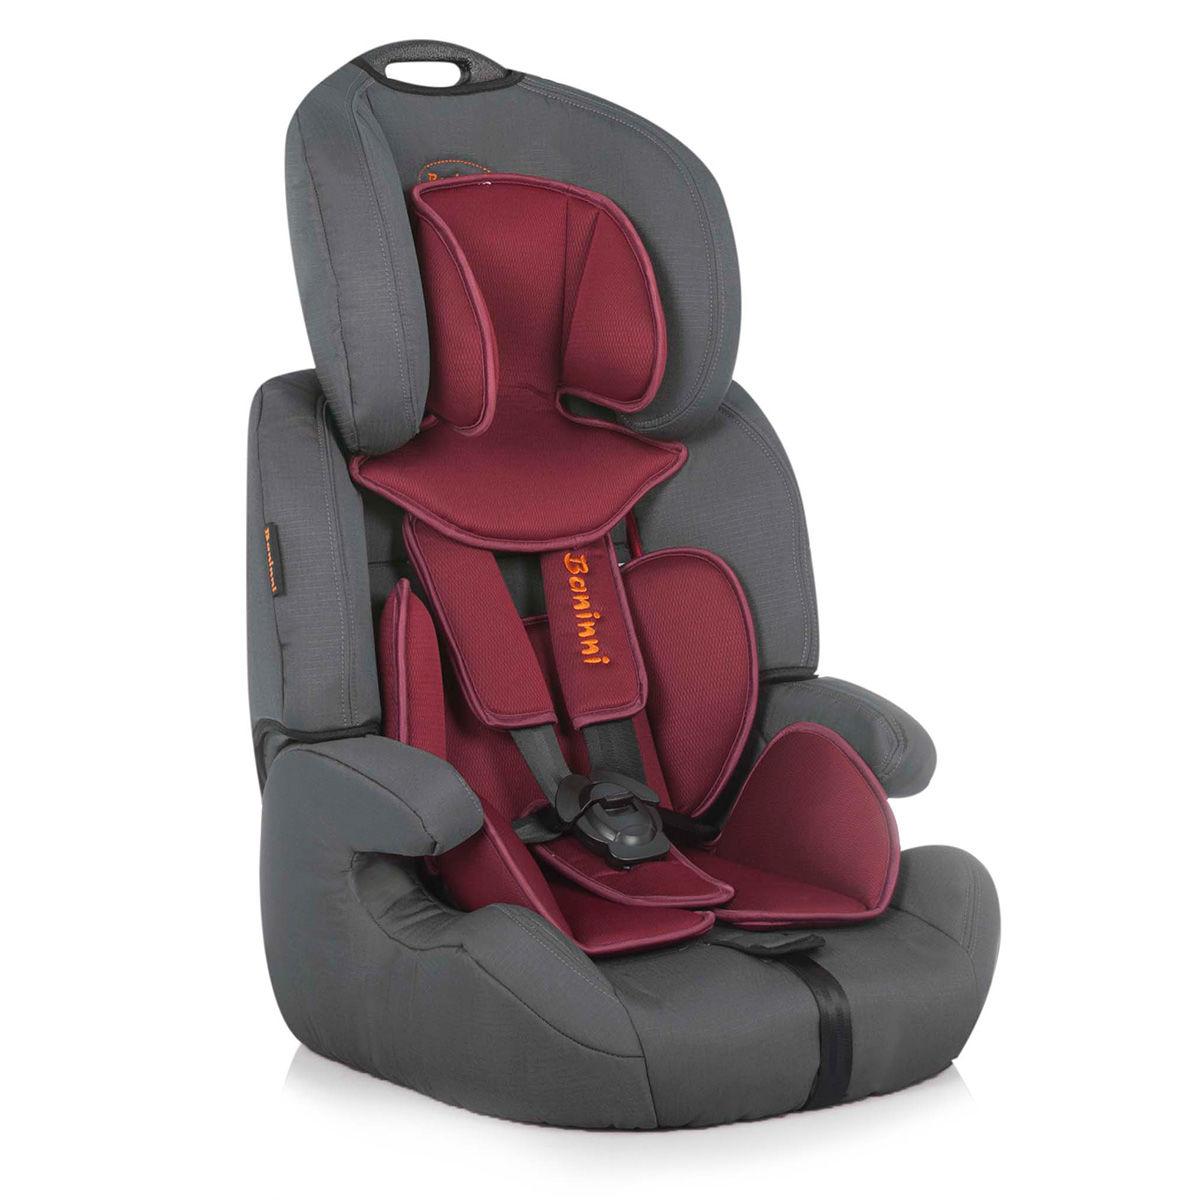 Afbeelding van Autostoel Baninni Pedro Red-Gray BN517 (9-36kg)